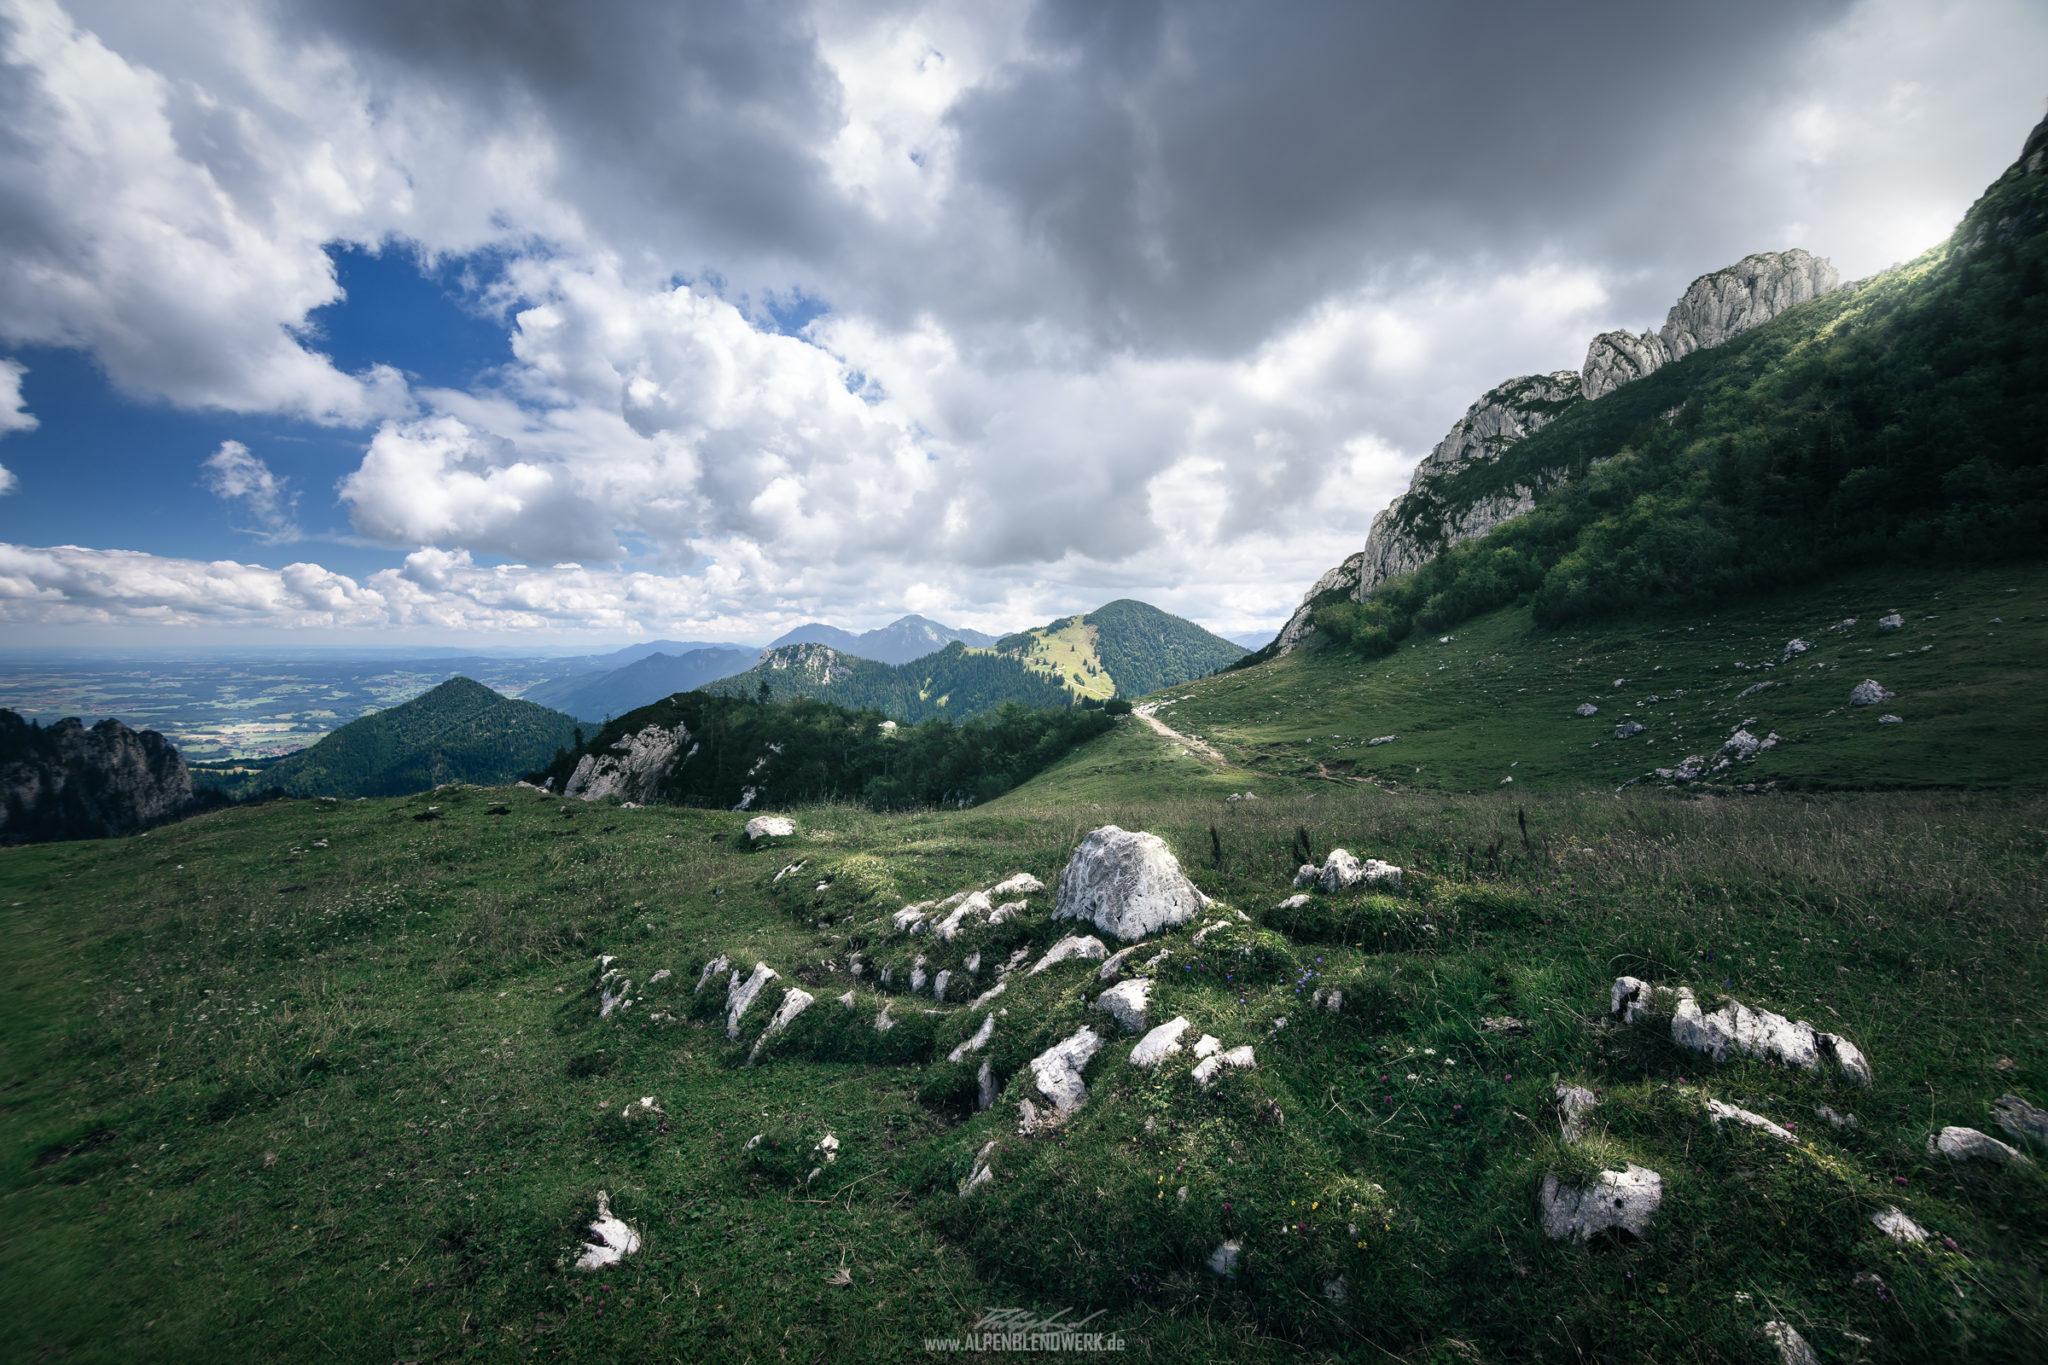 Kampenwand Landschafts Oberbayern